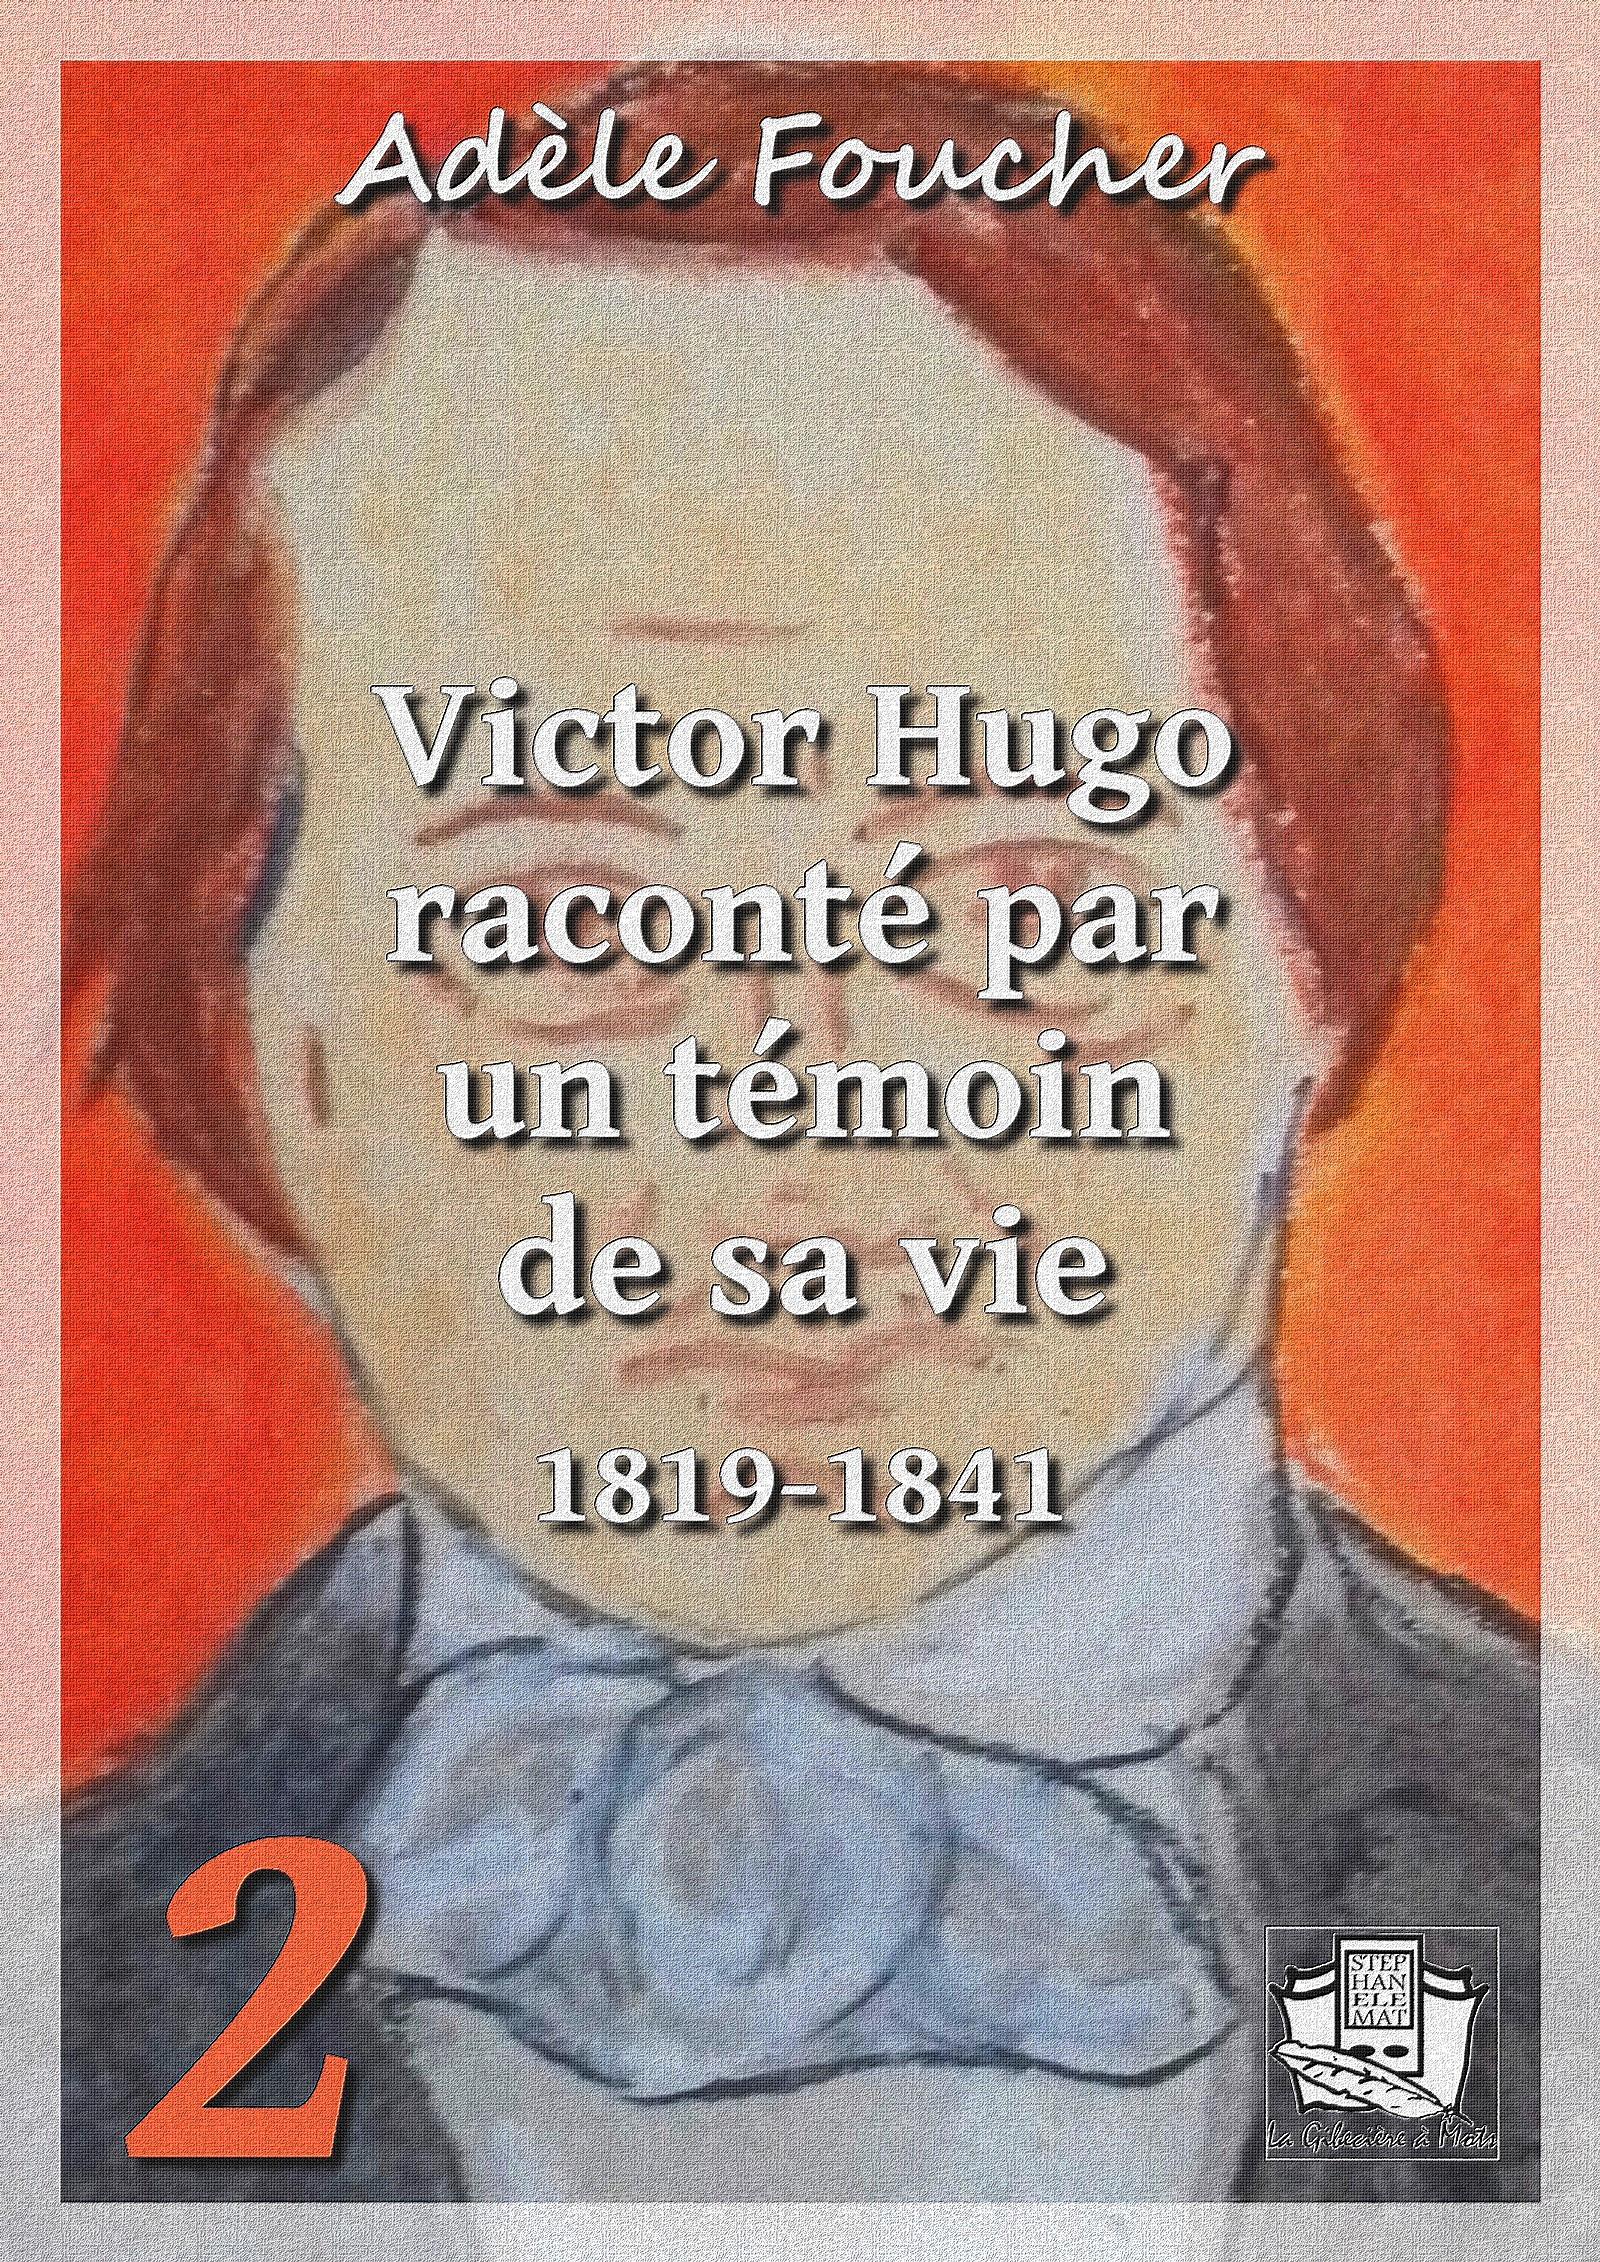 Victor Hugo raconté par un témoin de sa vie, TOME II